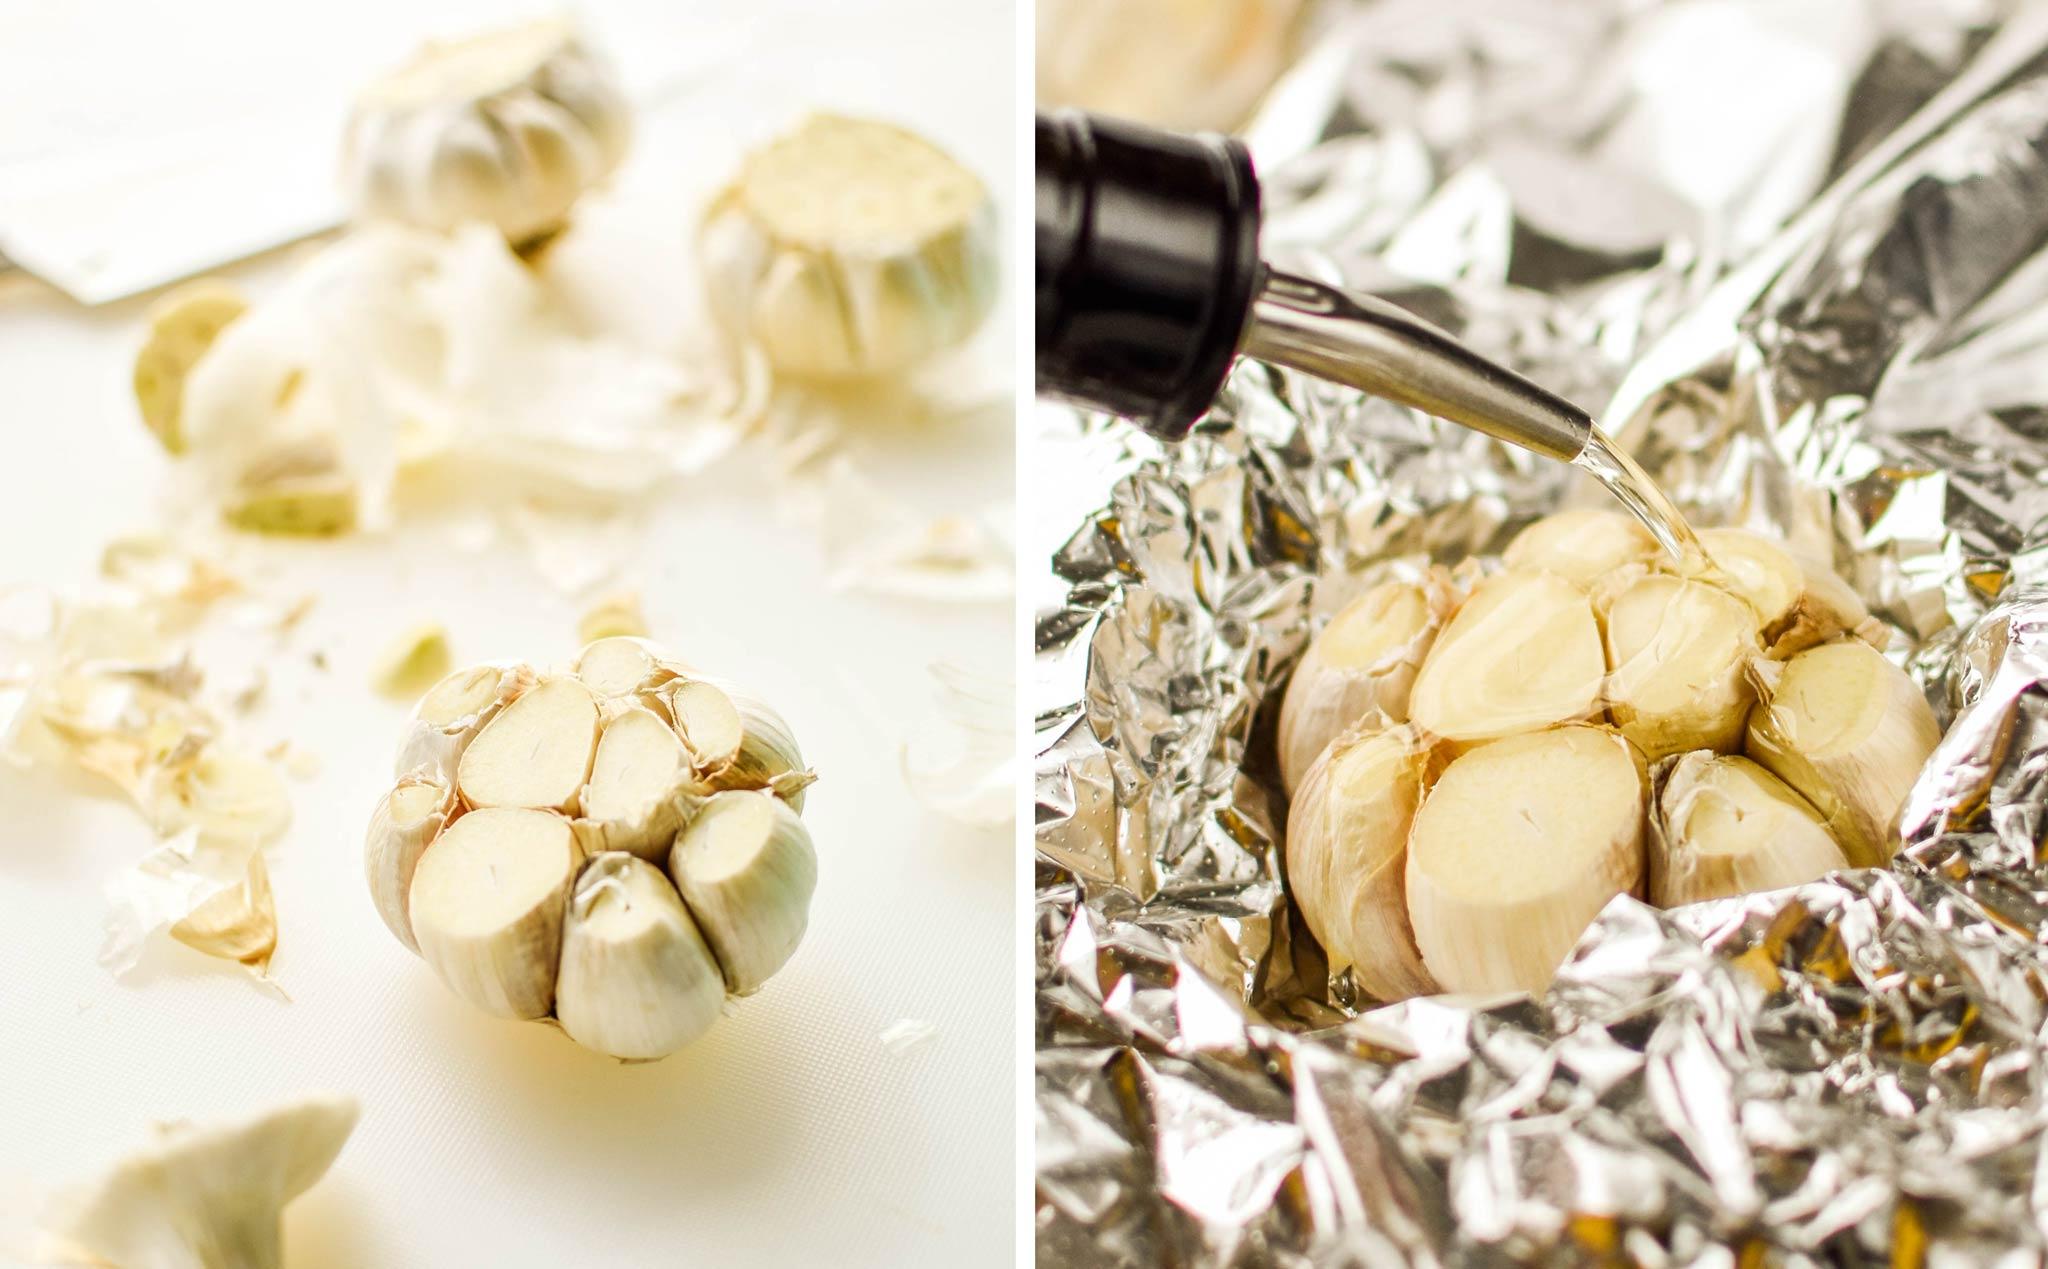 cutting a head of garlic to roast in the air fryer